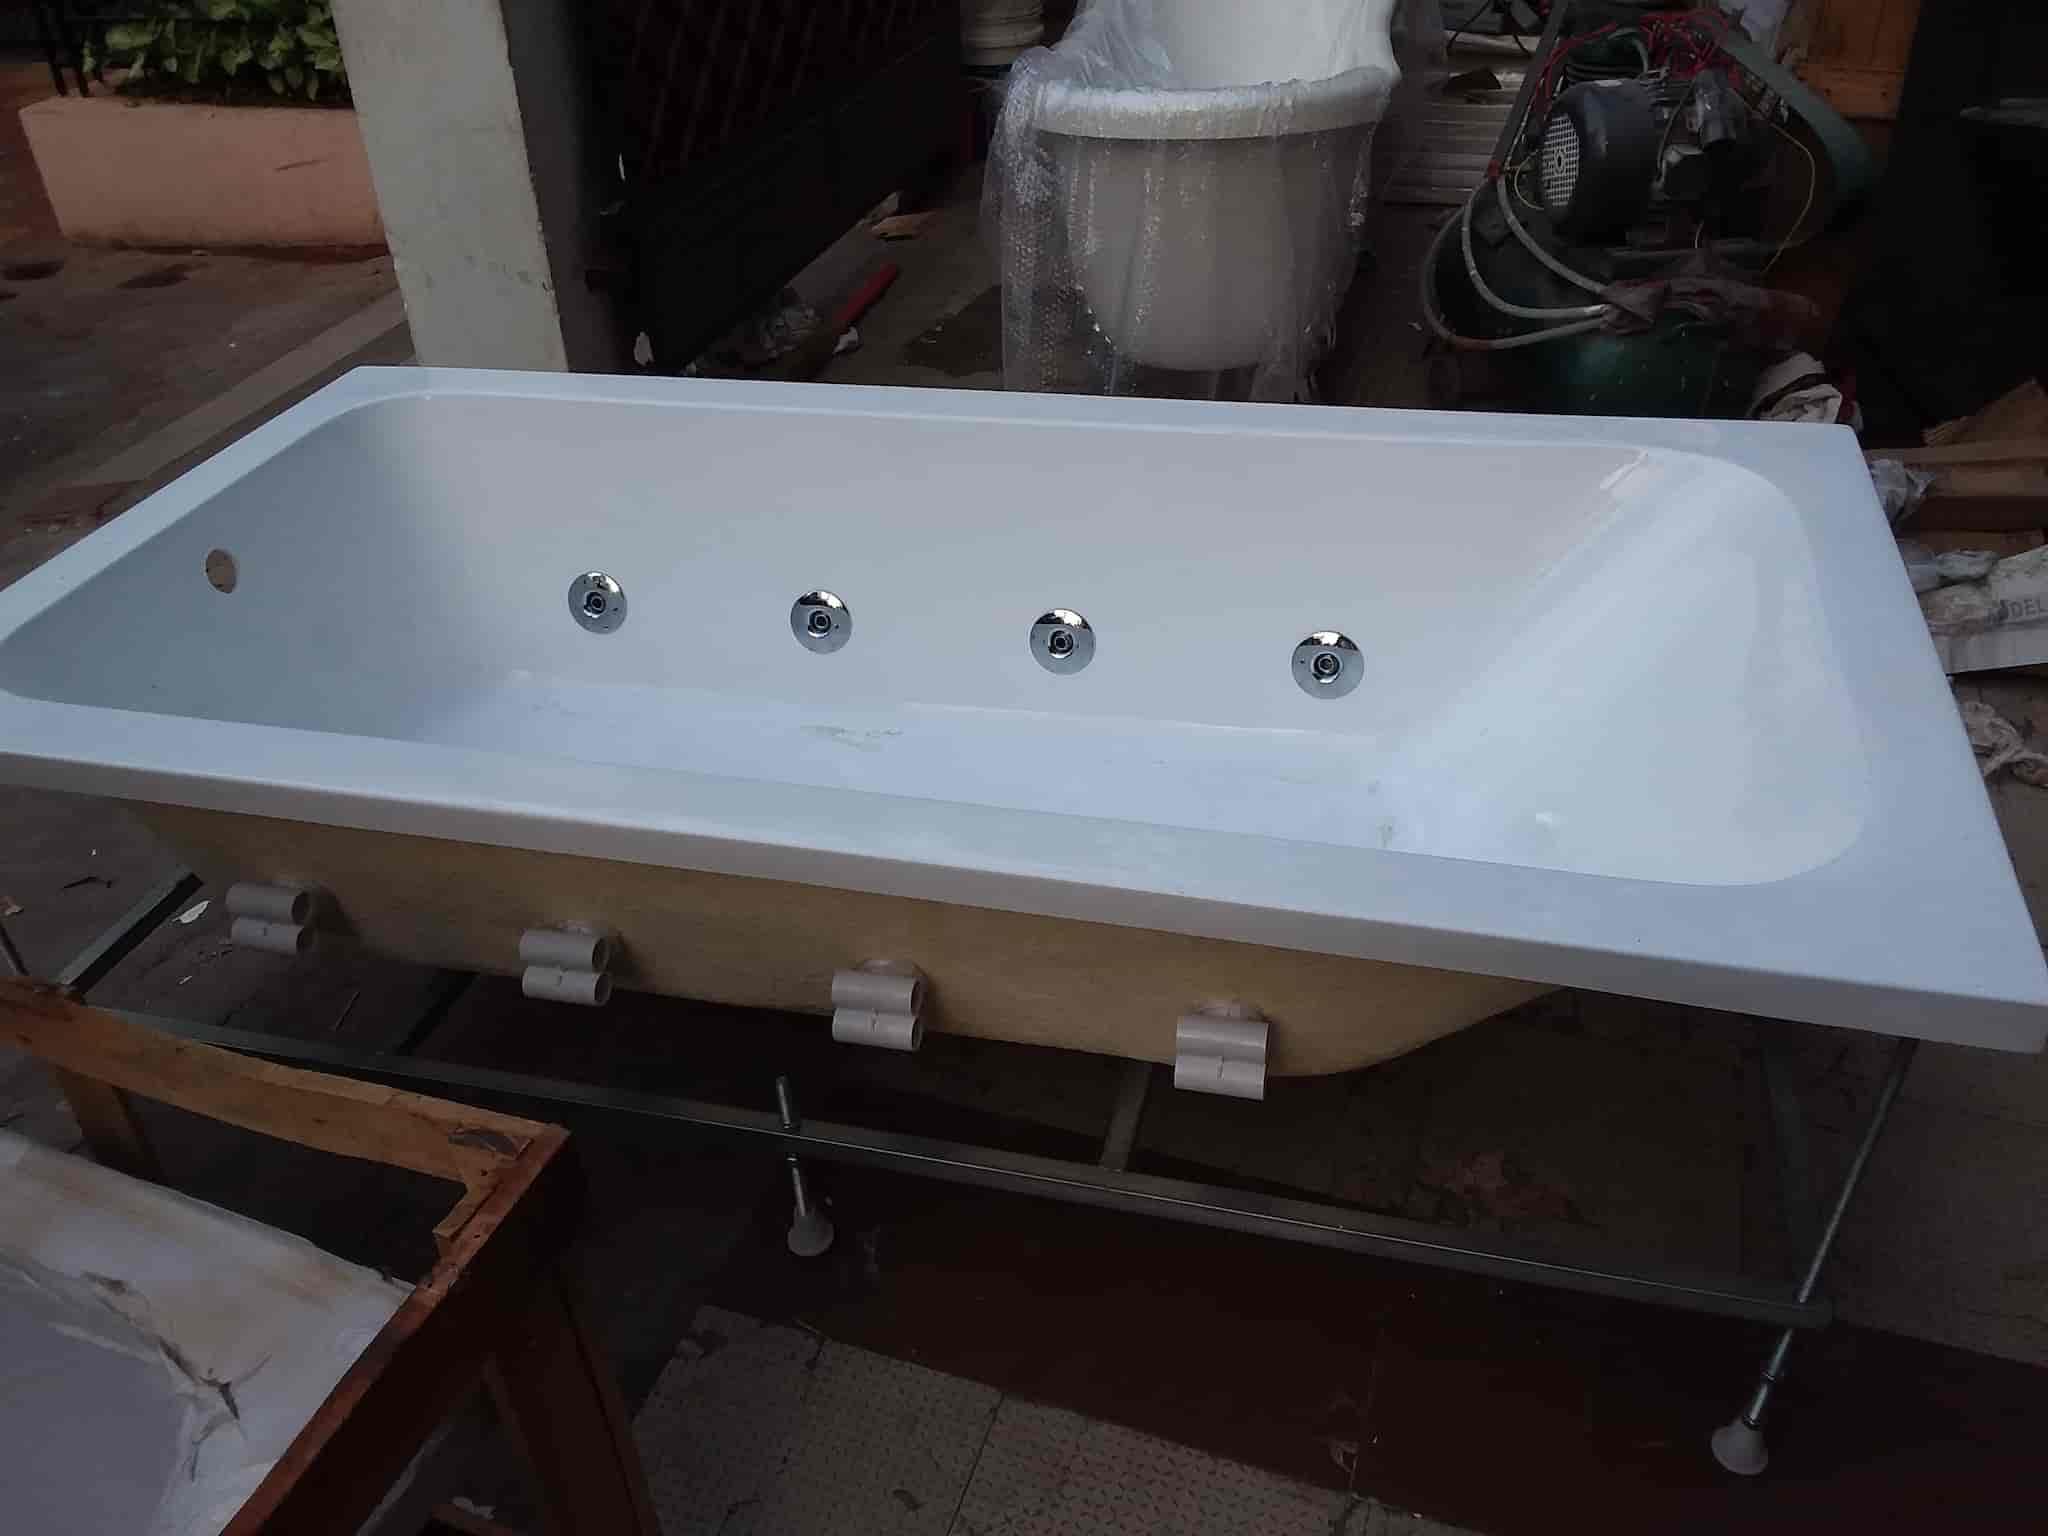 Heal Spa Bath Concepts Pvt Ltd Photos, Sri Krishna Nagar, Hyderabad ...